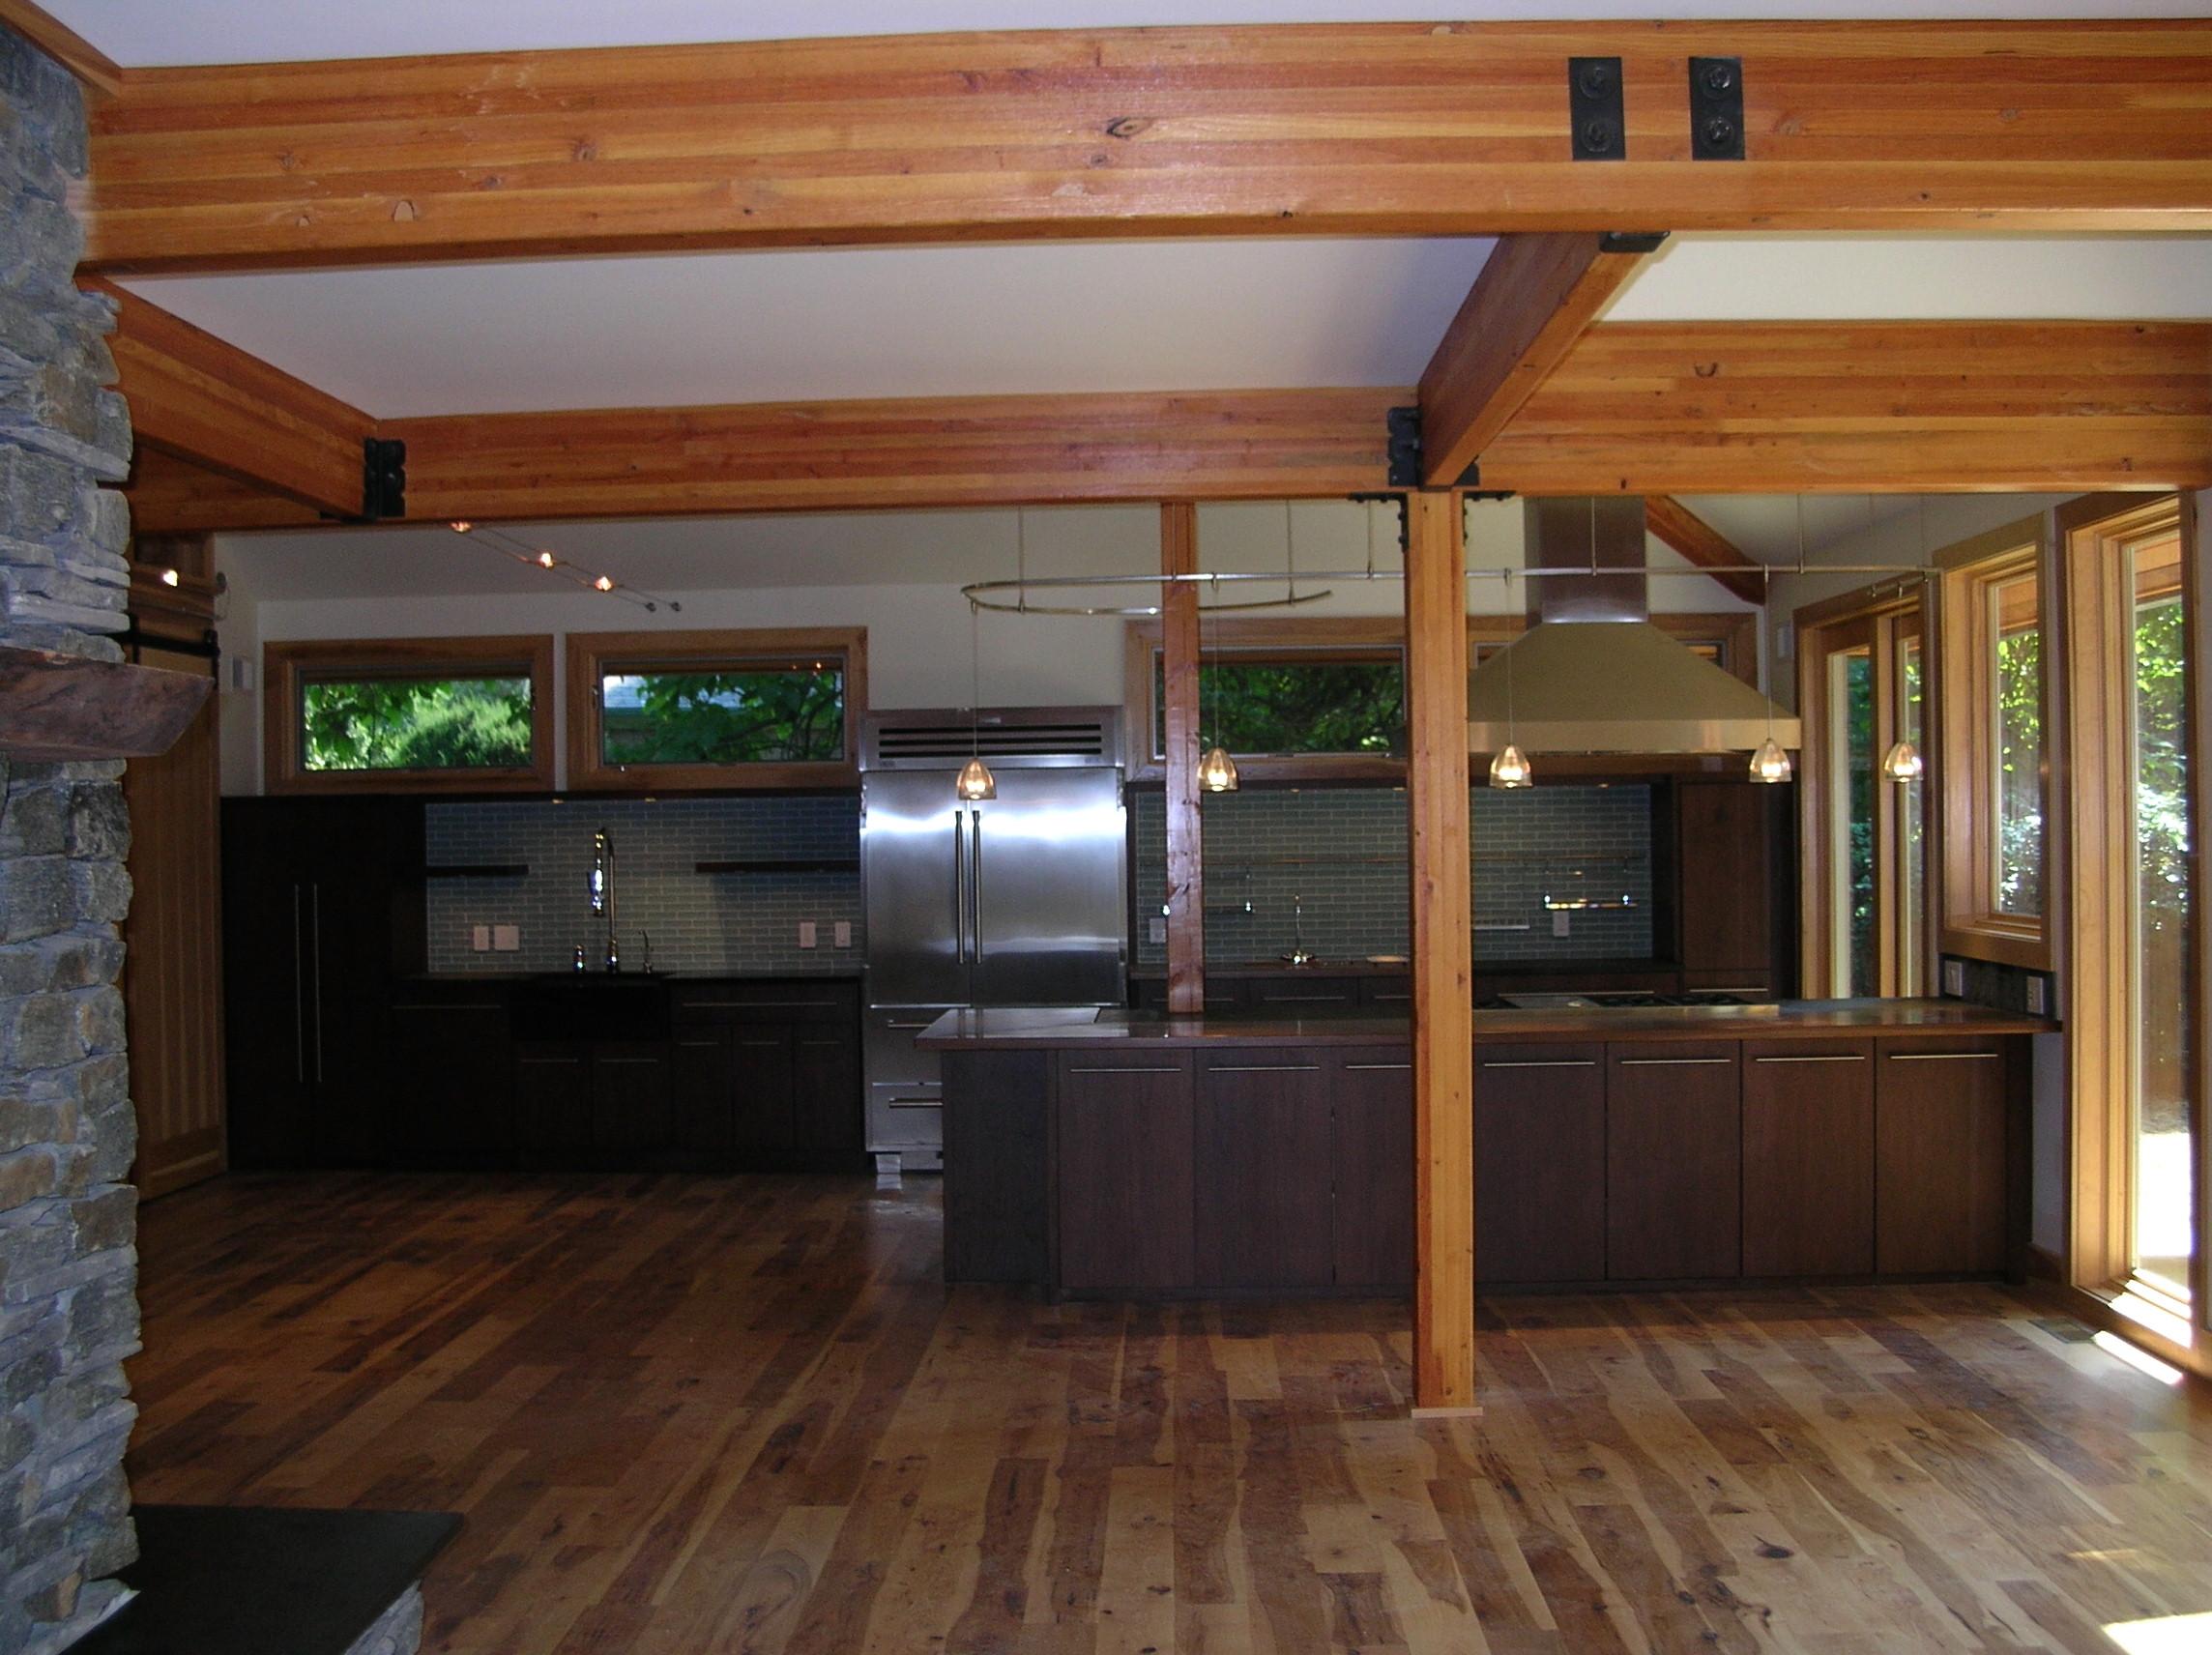 Price Kitchen with Dark Wood Cabinets Glulam Beams Glass Tile Backsplash Wood Flooring Pendant Lighting.jpg